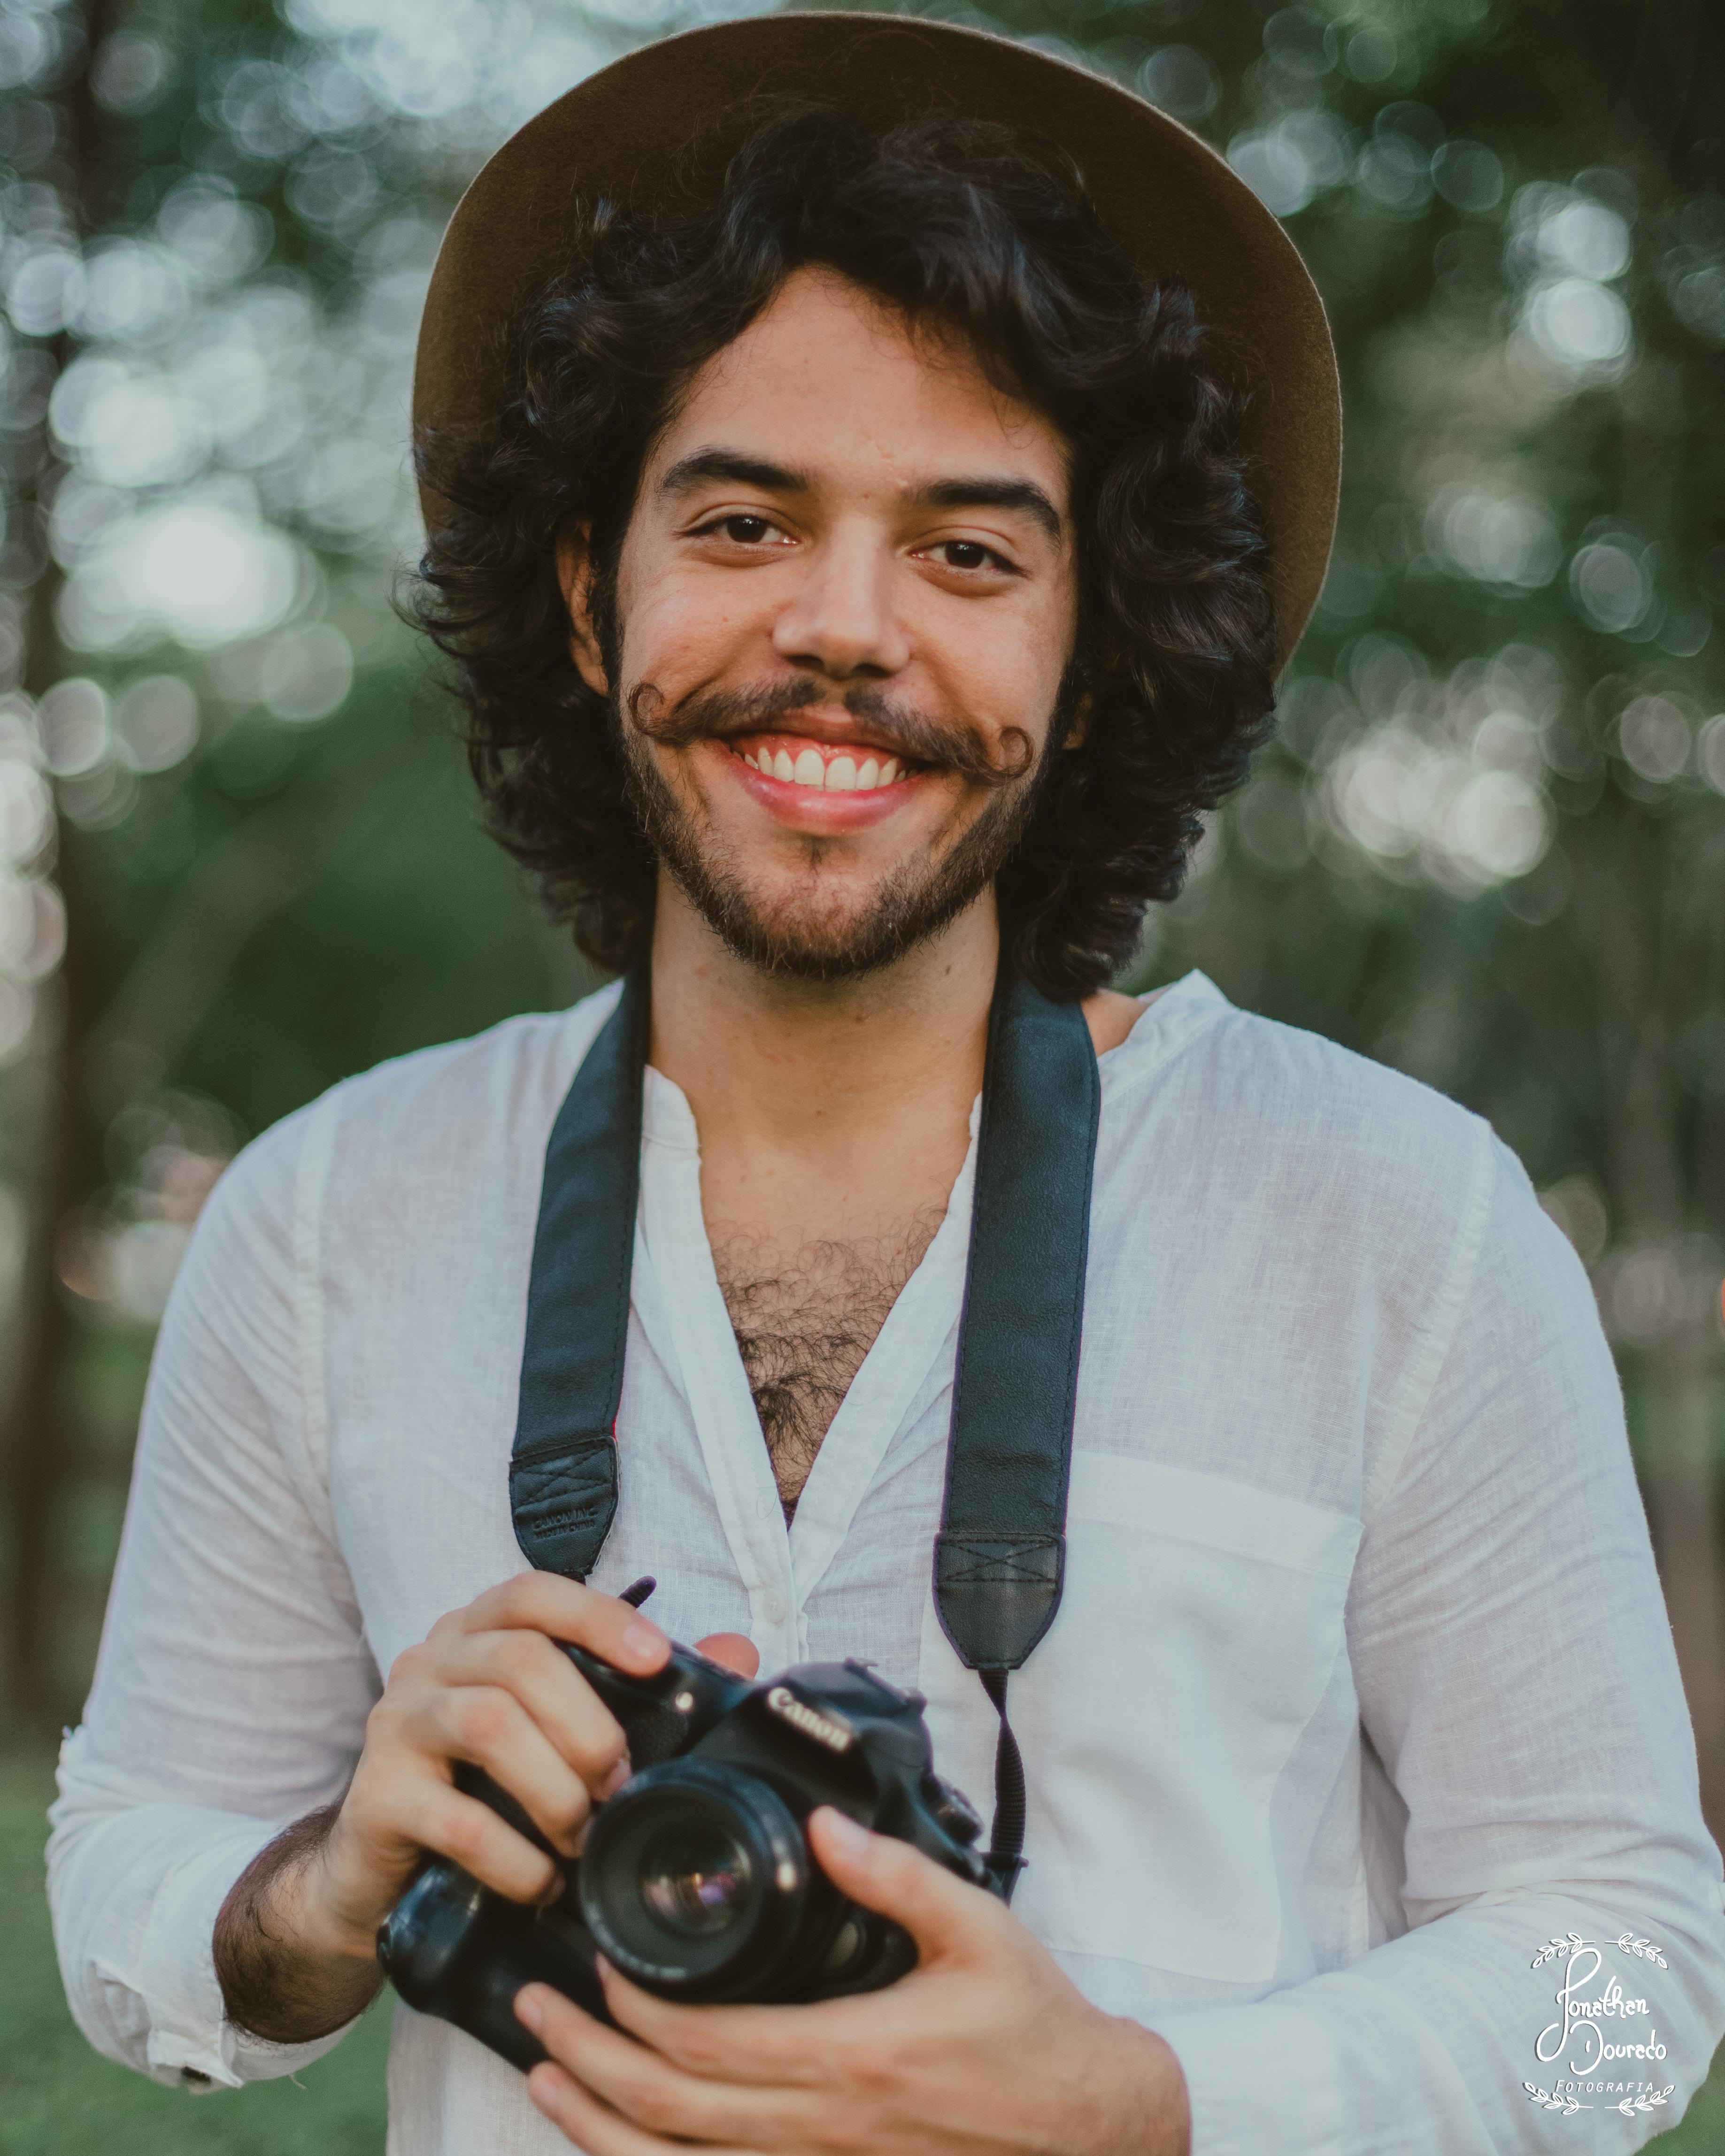 Sobre Jonathan Dourado - Fotógrafo de Famílias   Teresina - Piauí   Aniversários, Casamentos, Documental, Formaturas